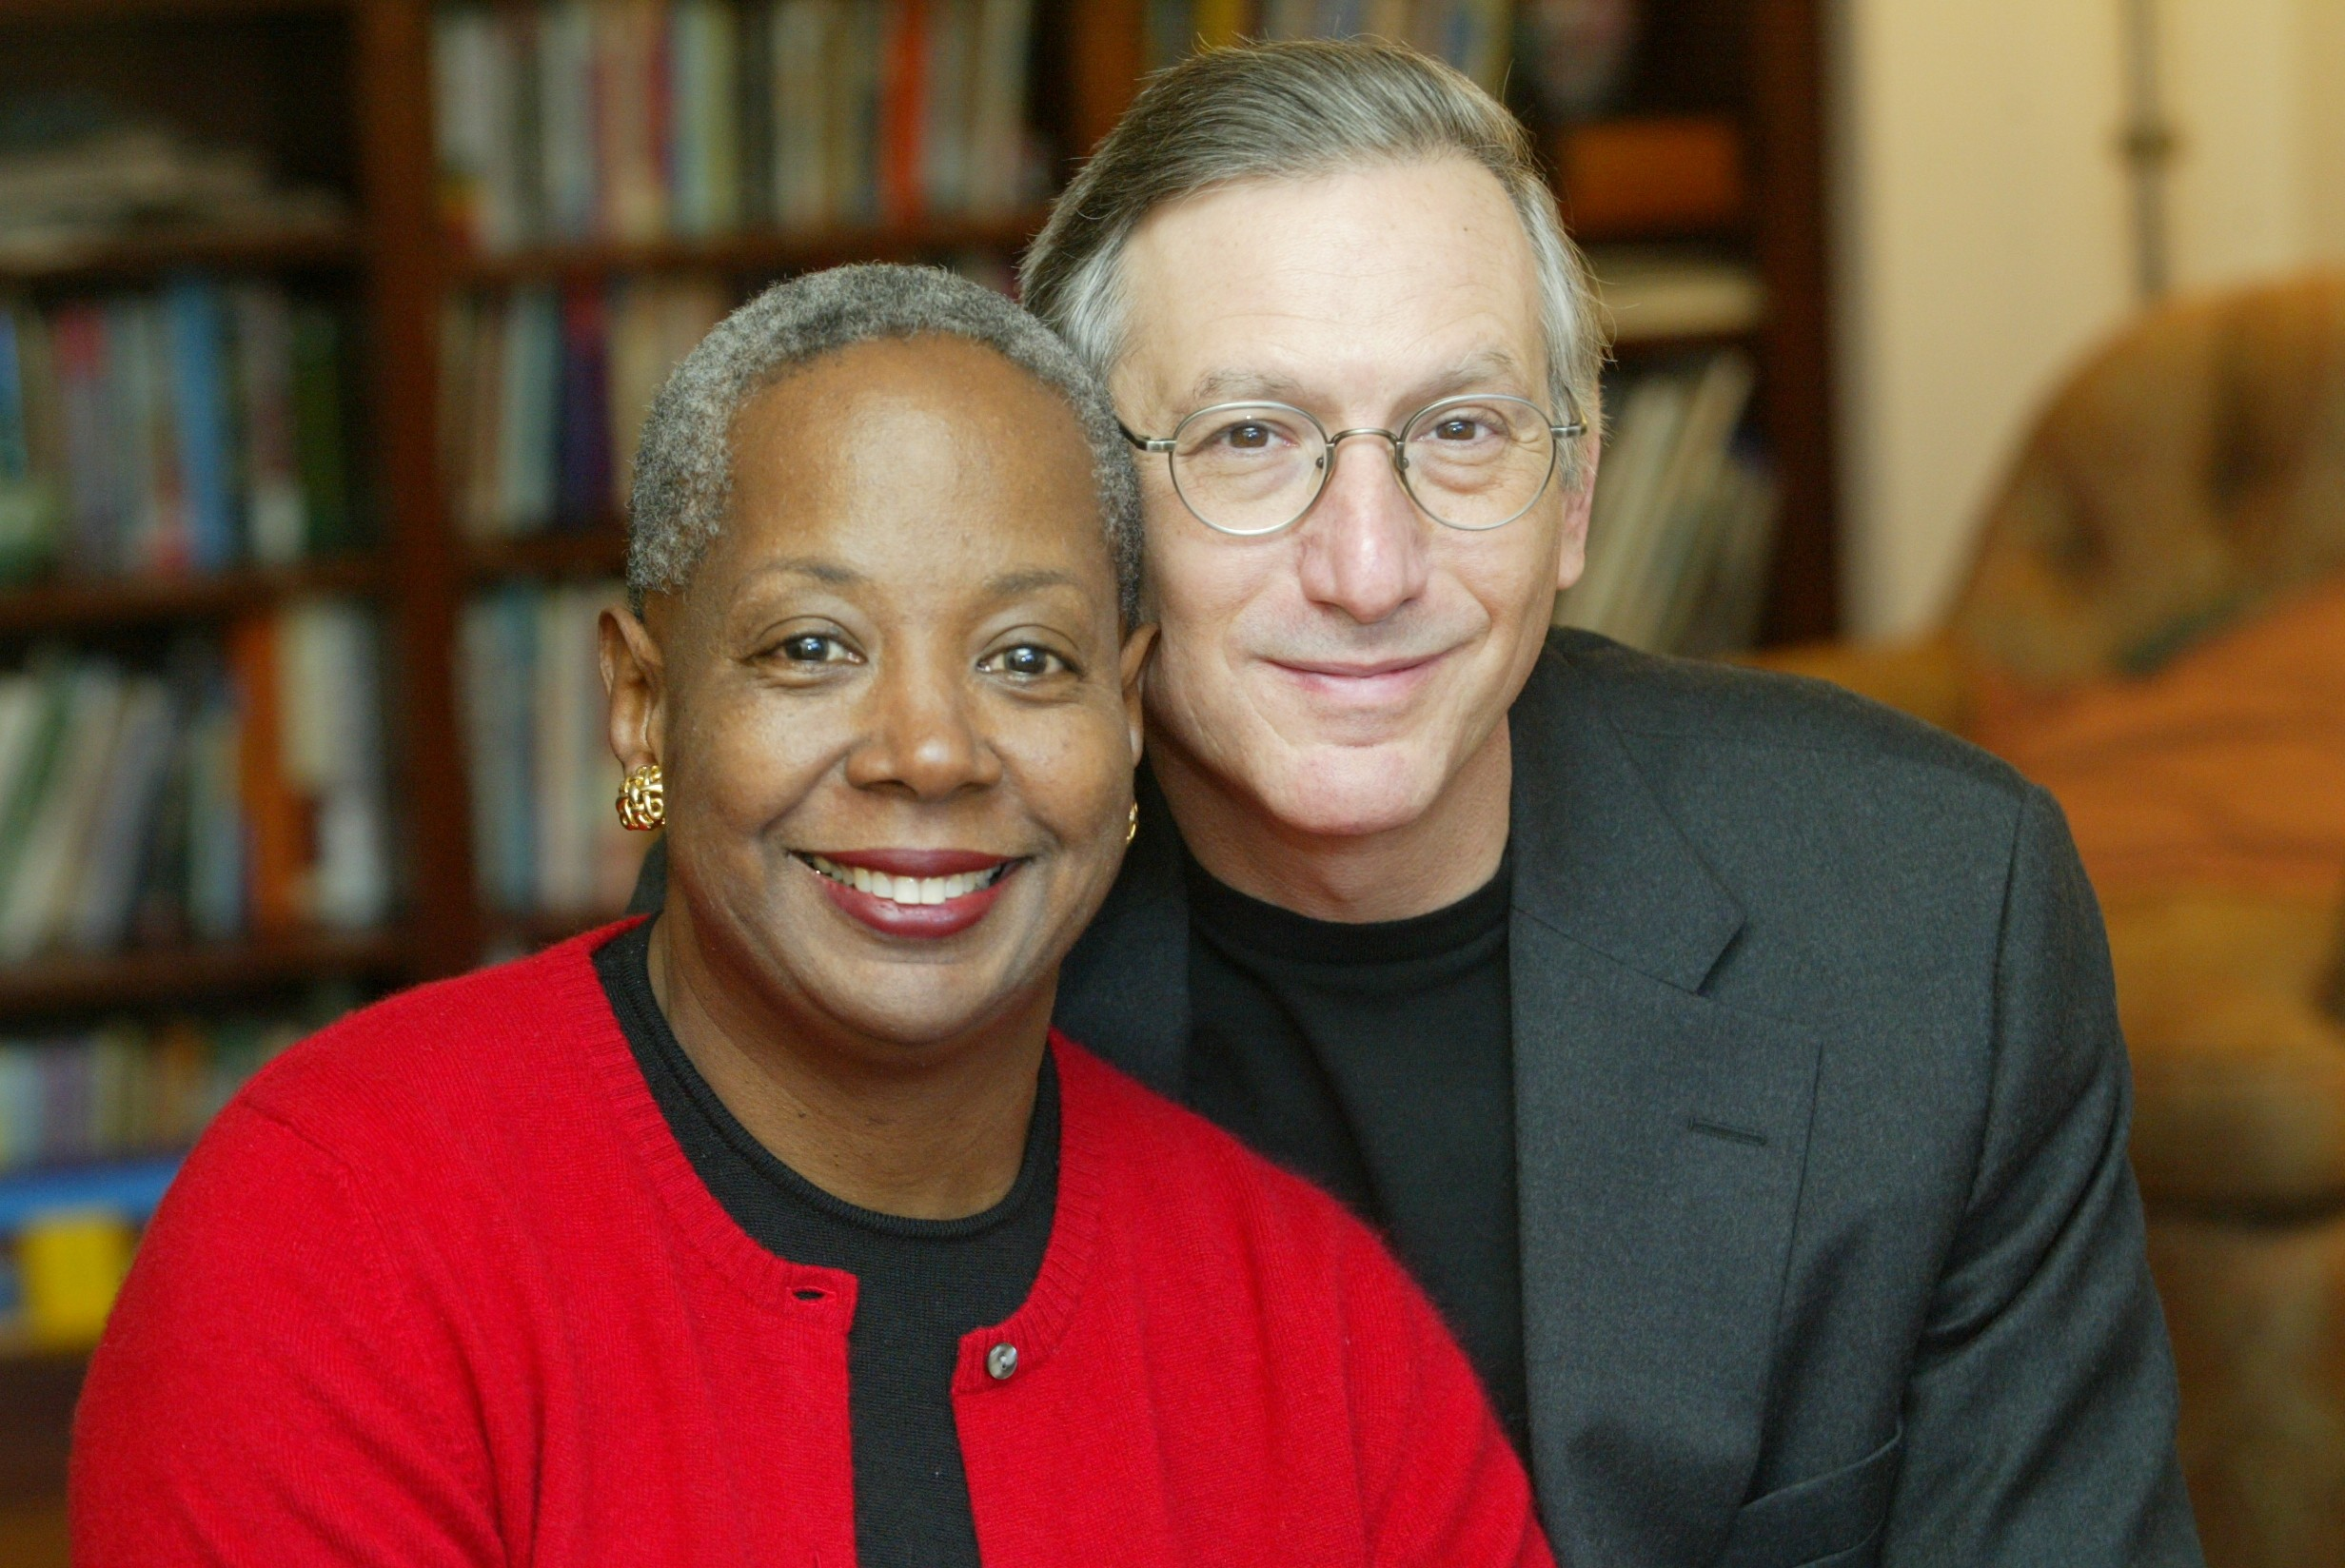 Dorothy Gaiter and John Brecher, creators of Open That Bottle Night